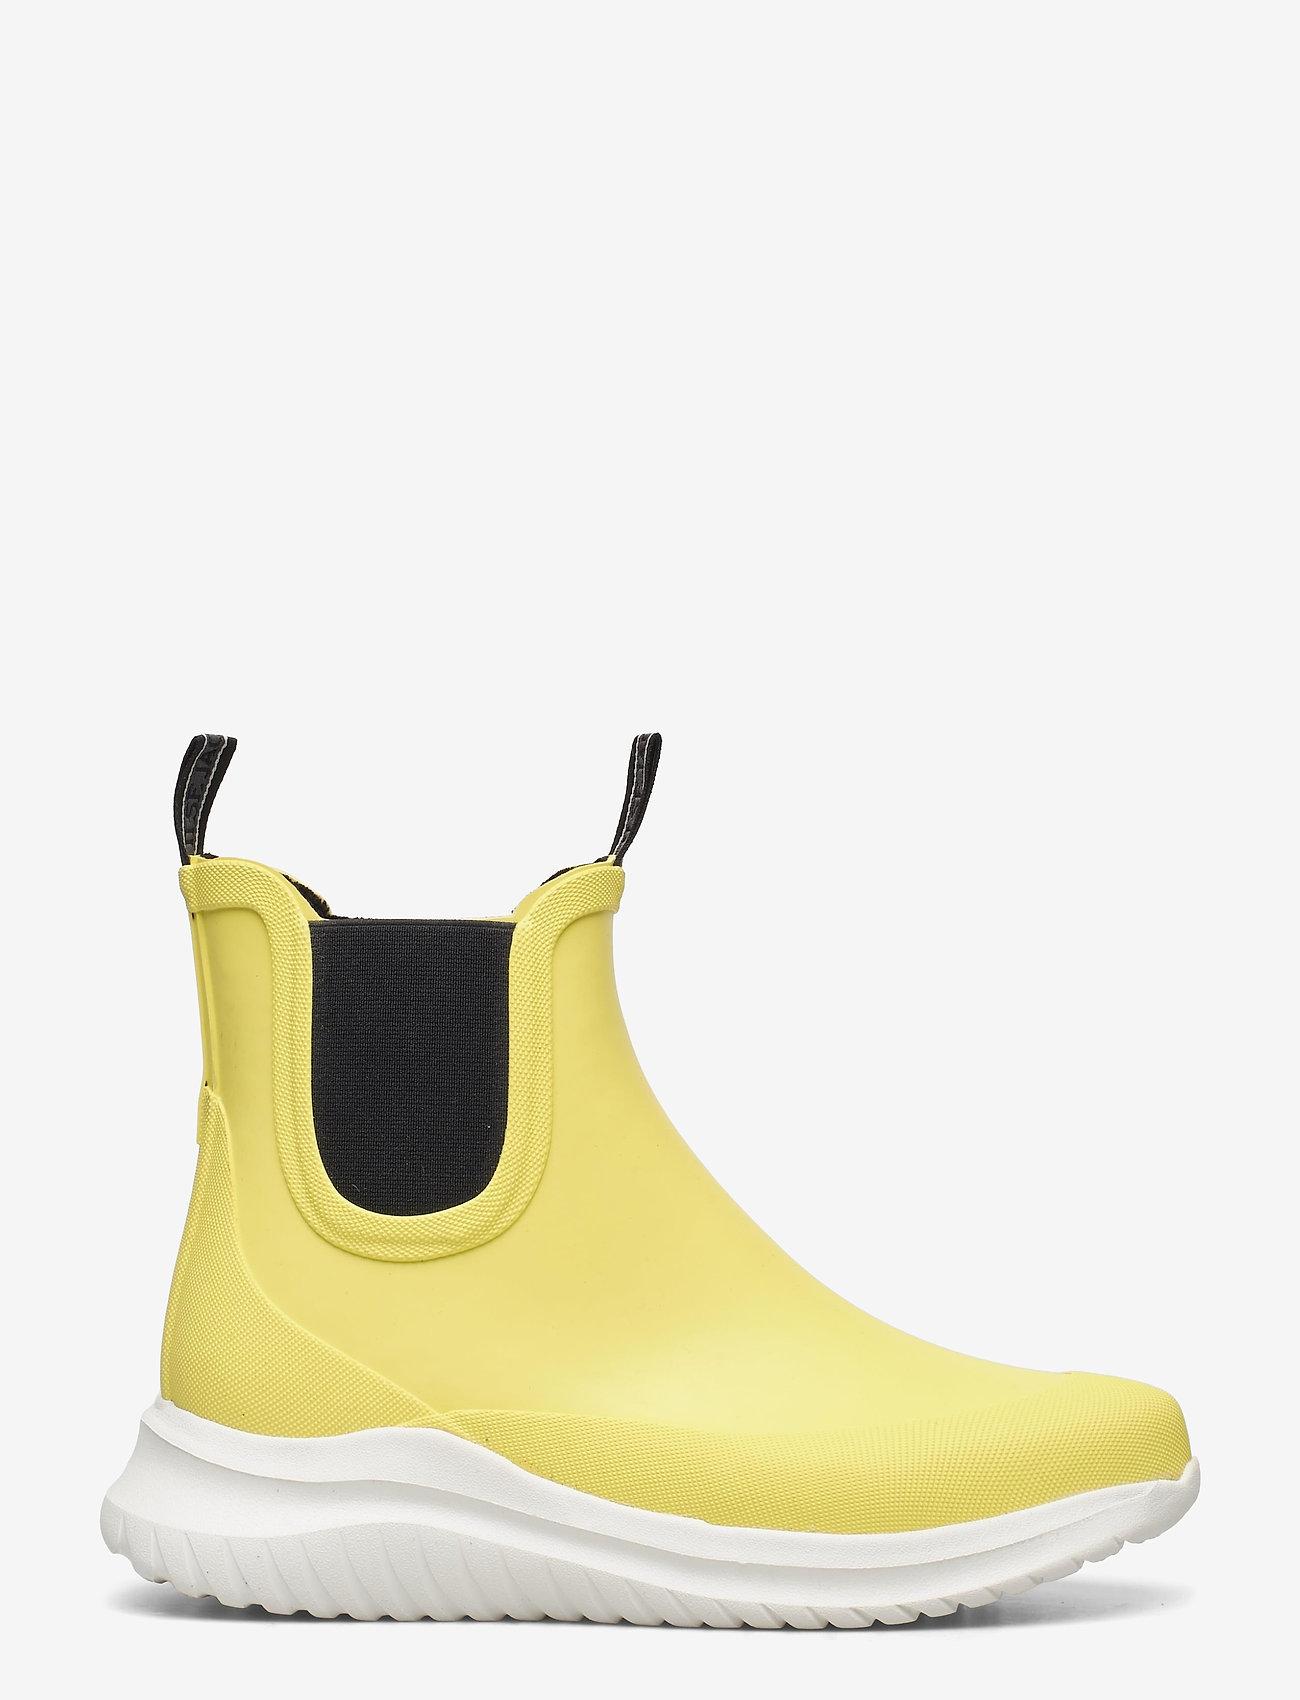 Ilse Jacobsen - Short rubber boots - sko - sunbeam - 1